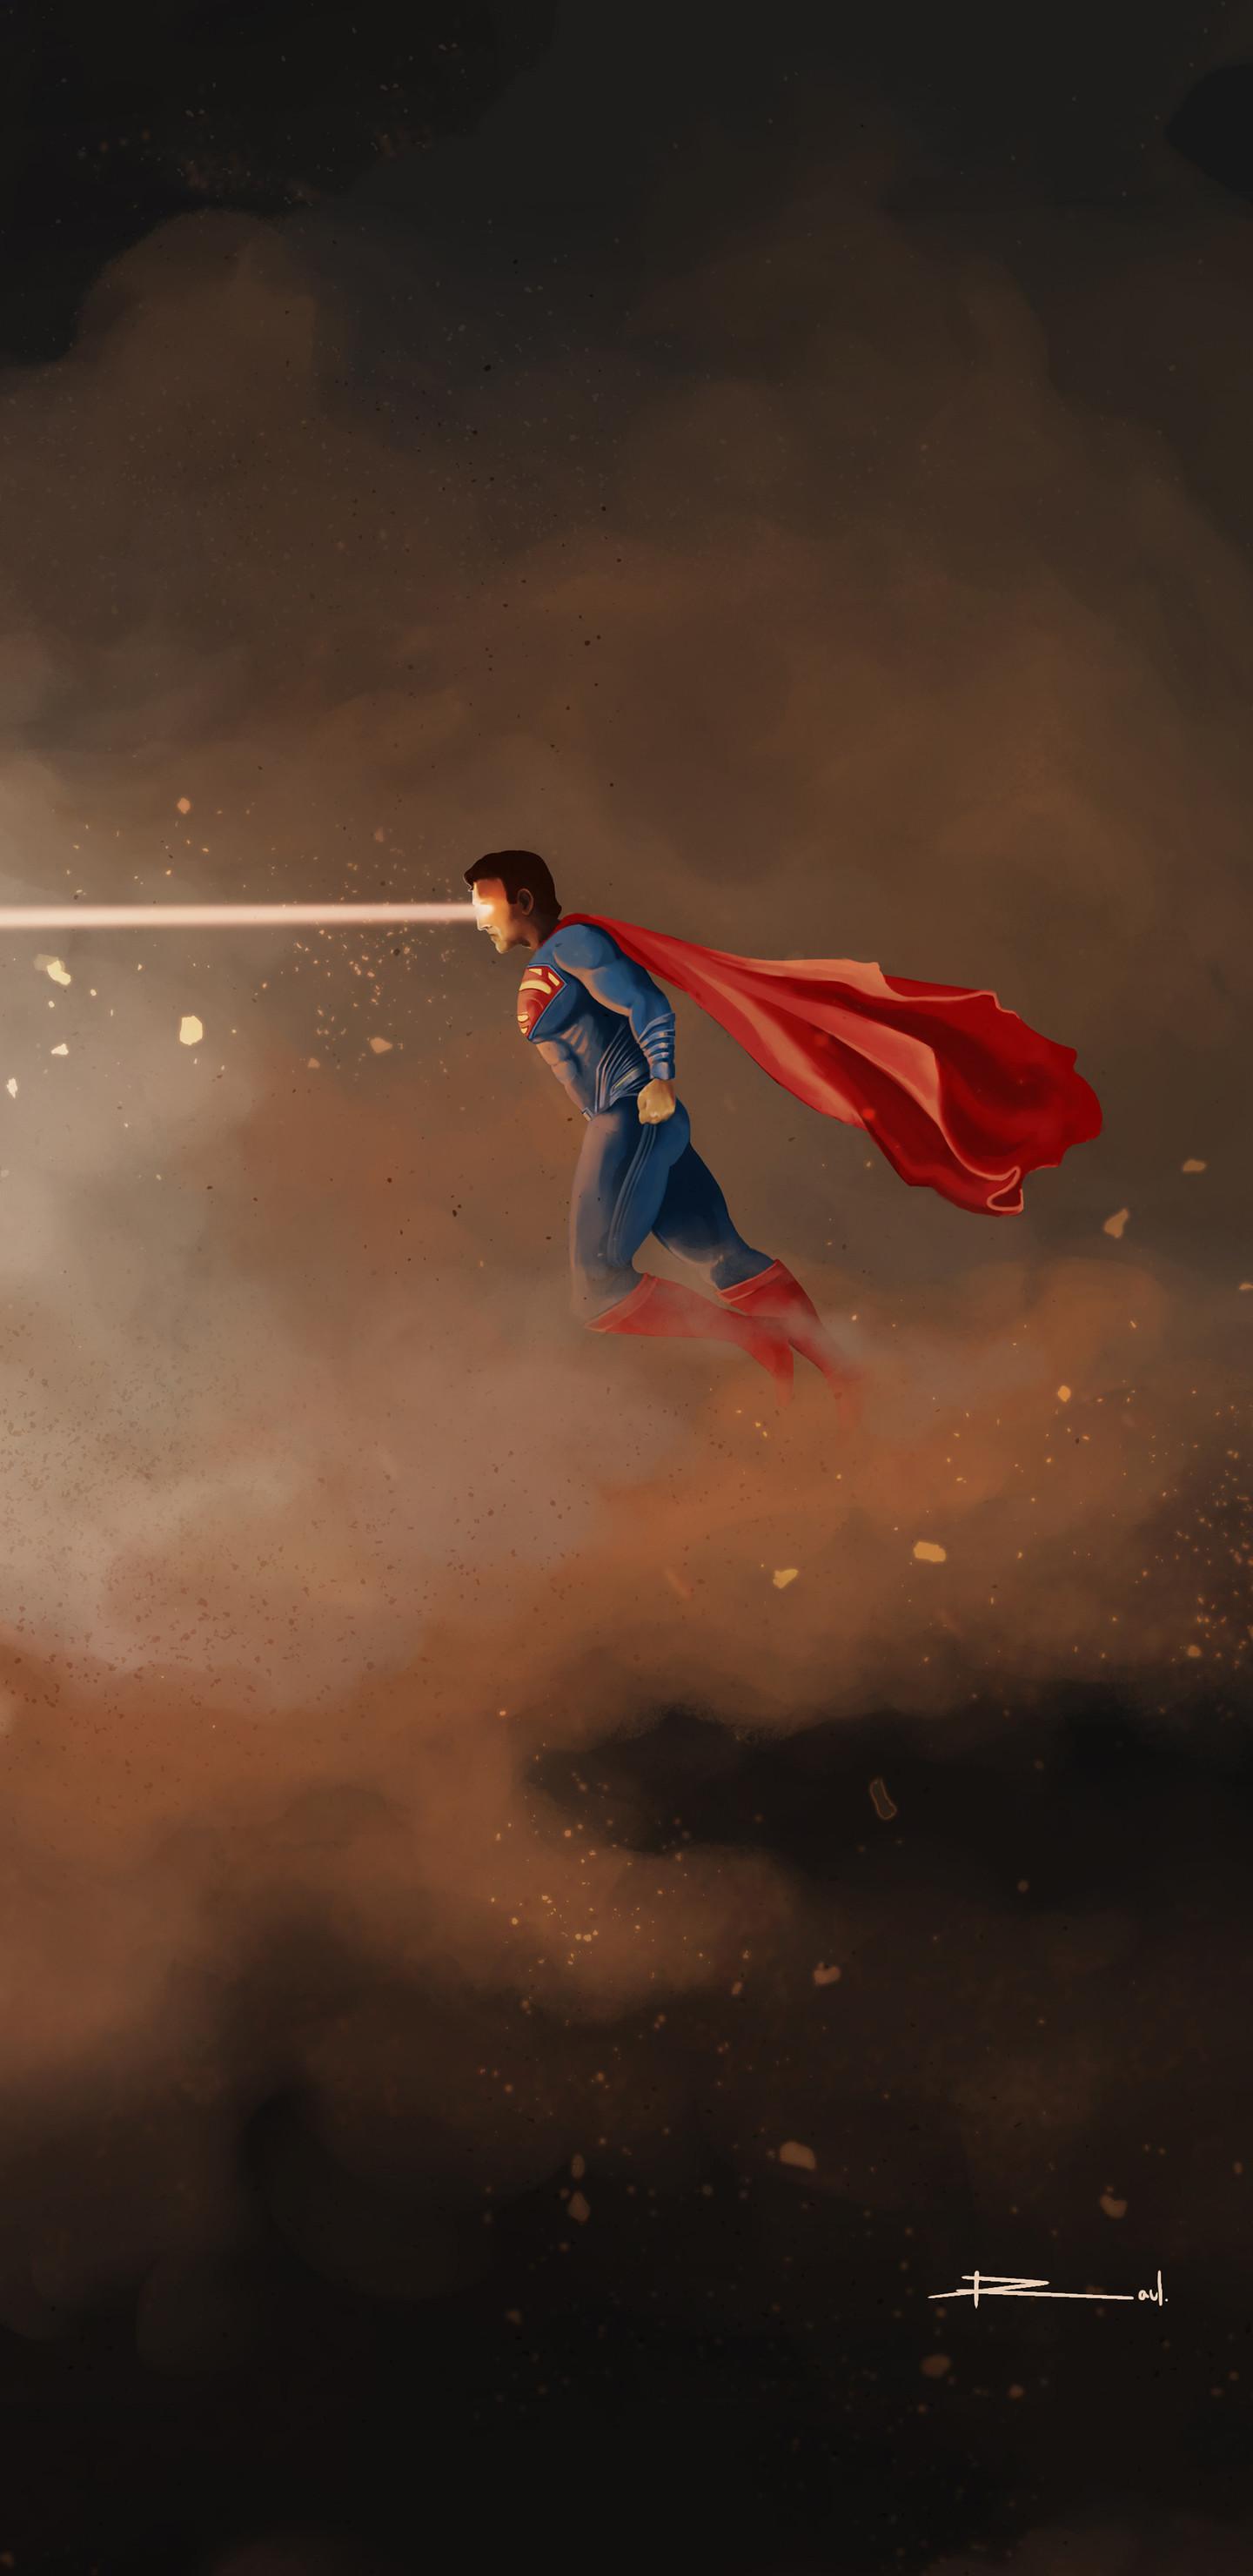 Res: 1440x2960, Doomsday Vs Superman 8k (Samsung Galaxy Note 9,8, S9,S8,S8+ QHD)